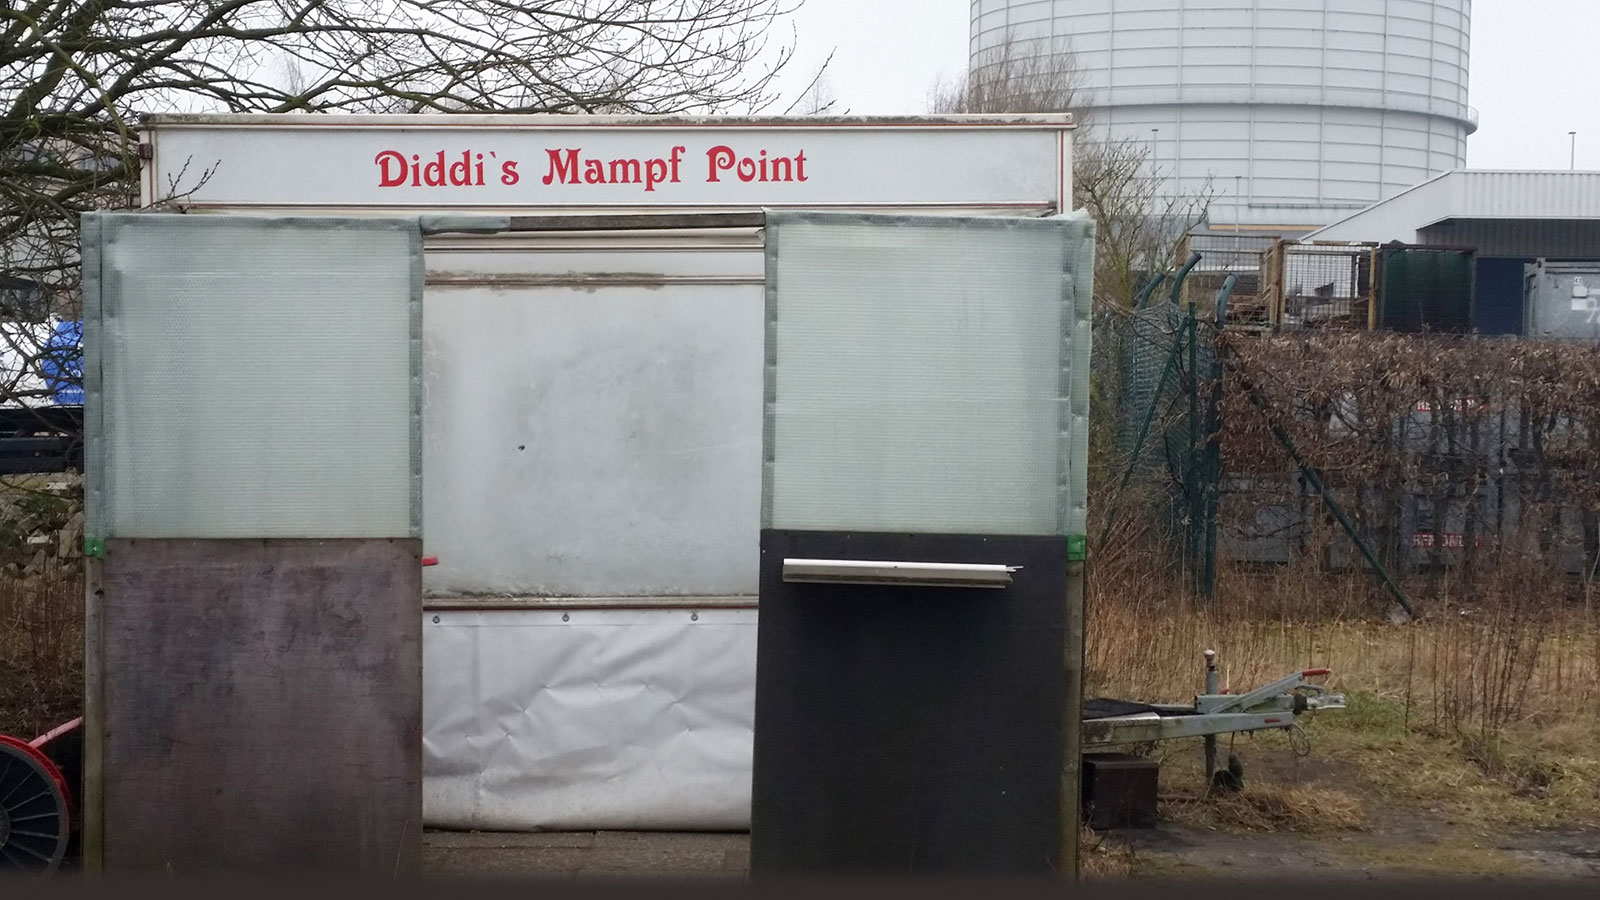 Lübeck Diddis Mampf Point